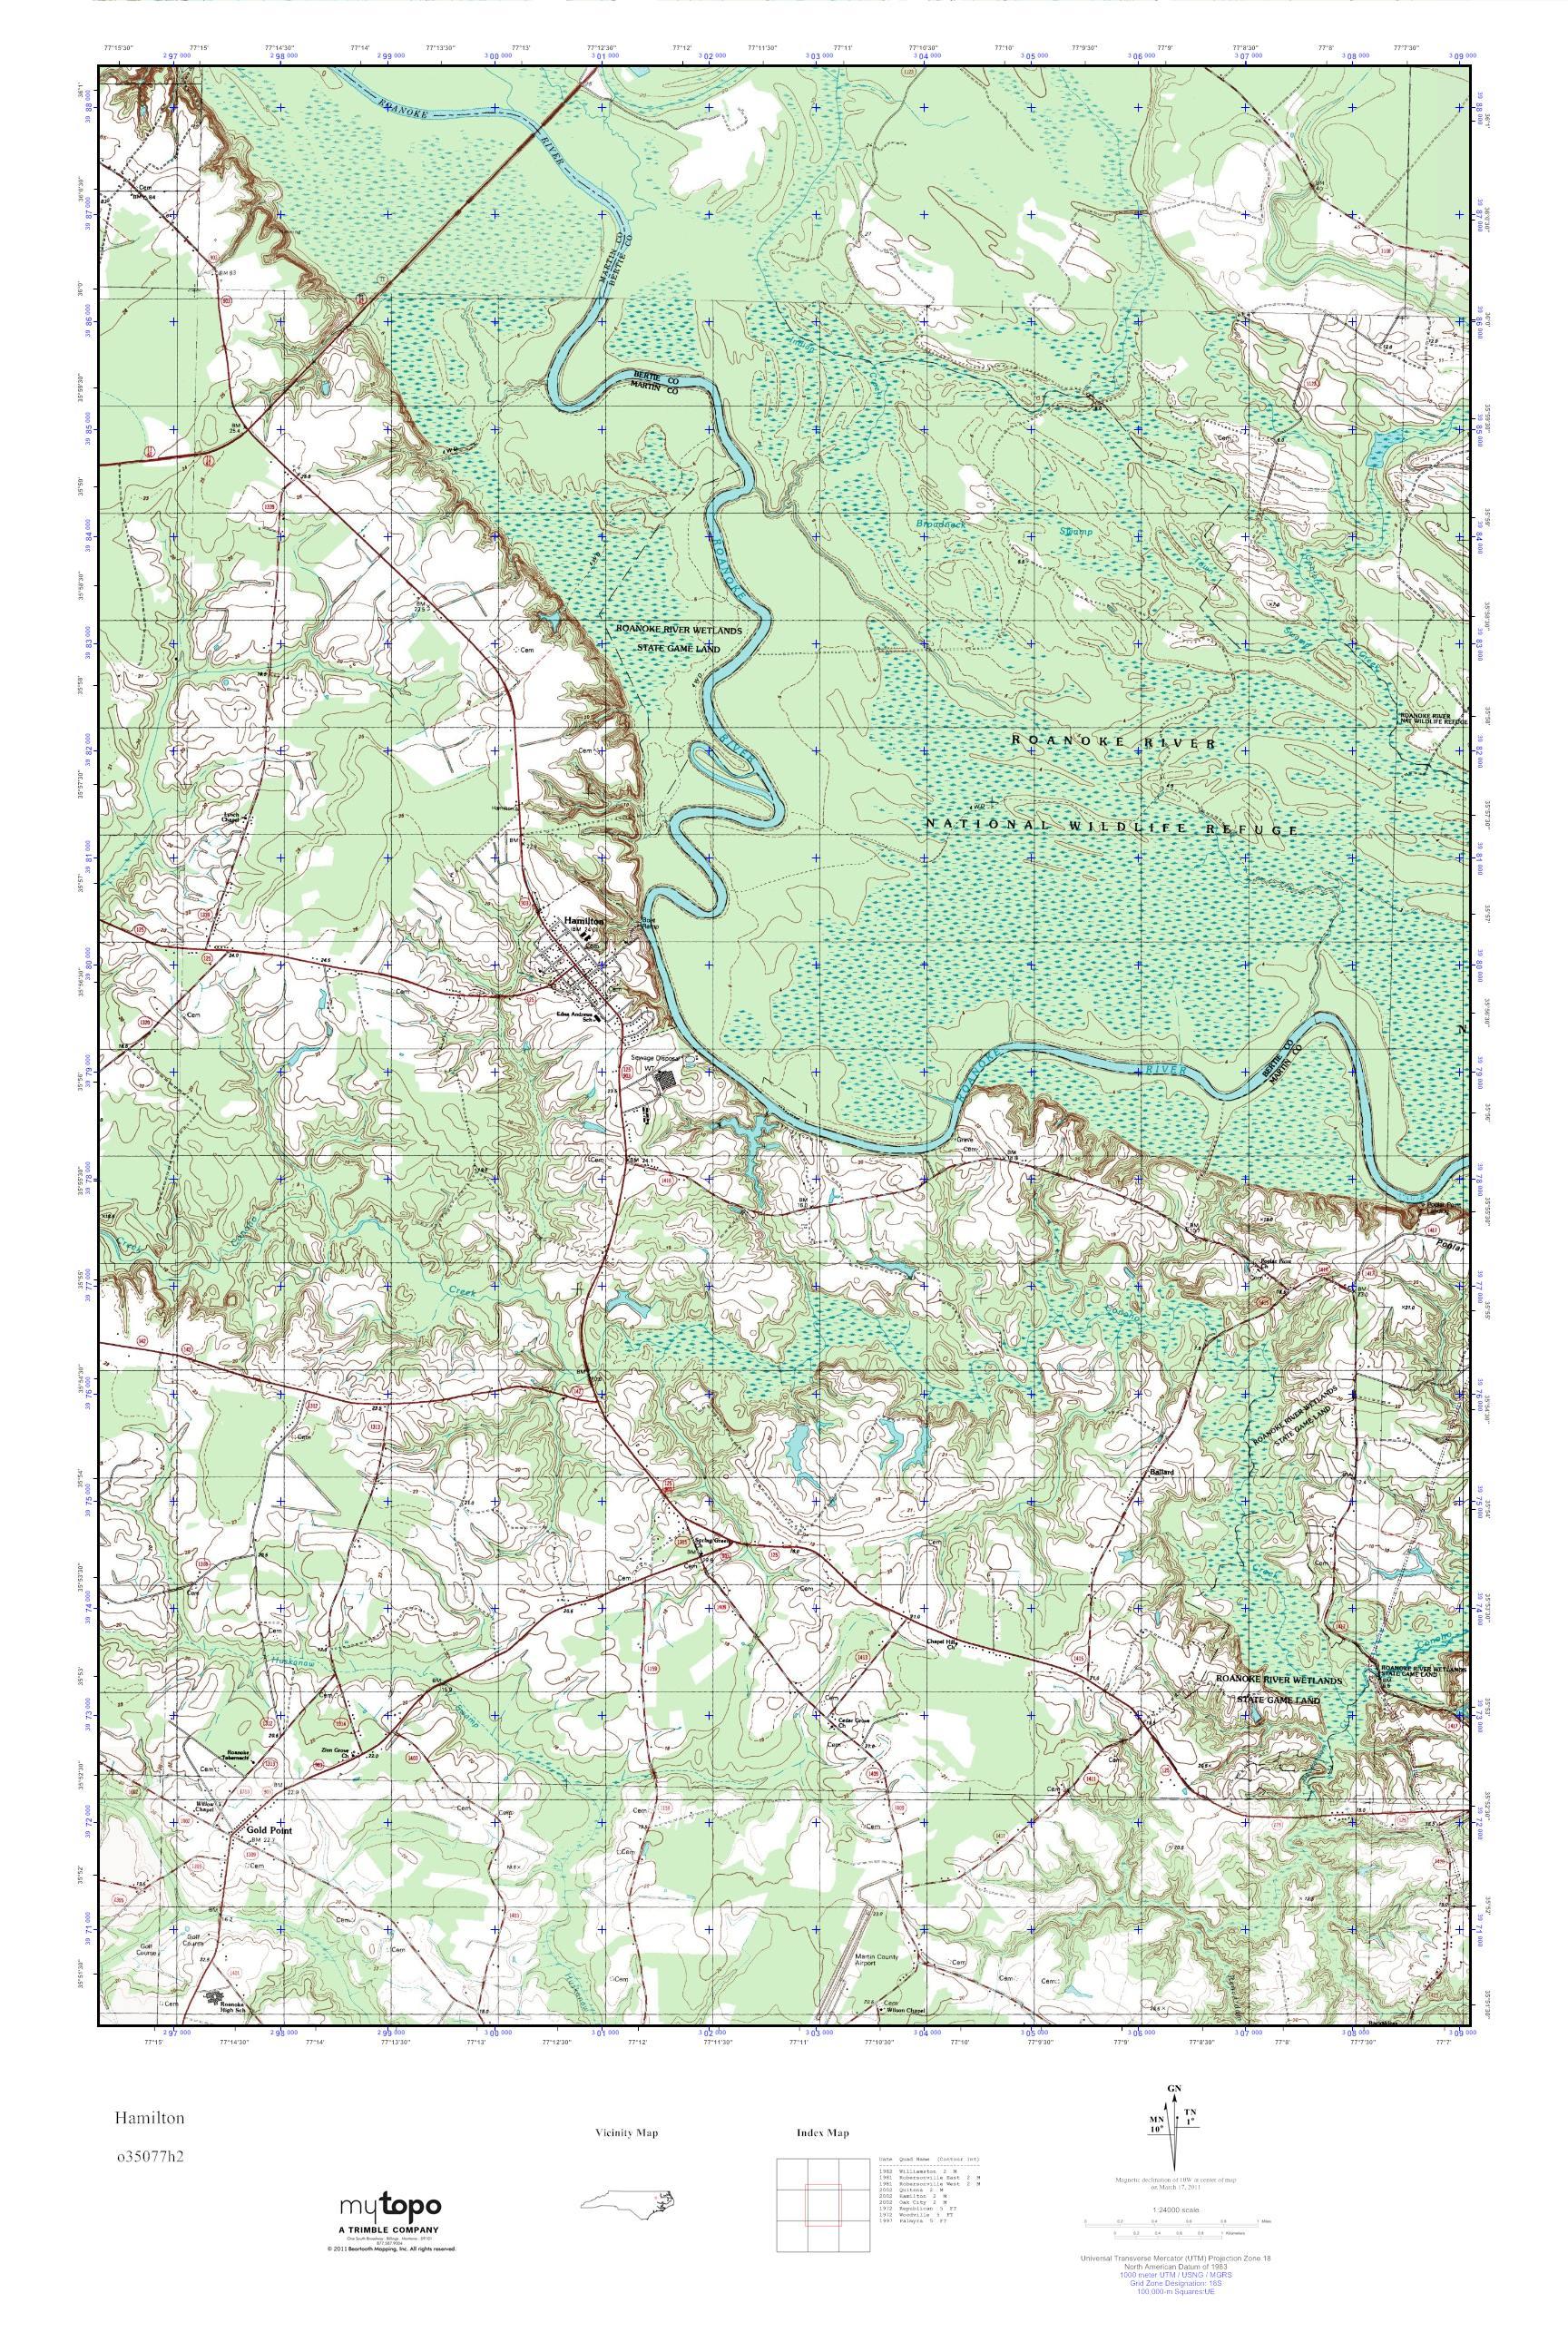 Hamilton Nc Map.Mytopo Hamilton North Carolina Usgs Quad Topo Map